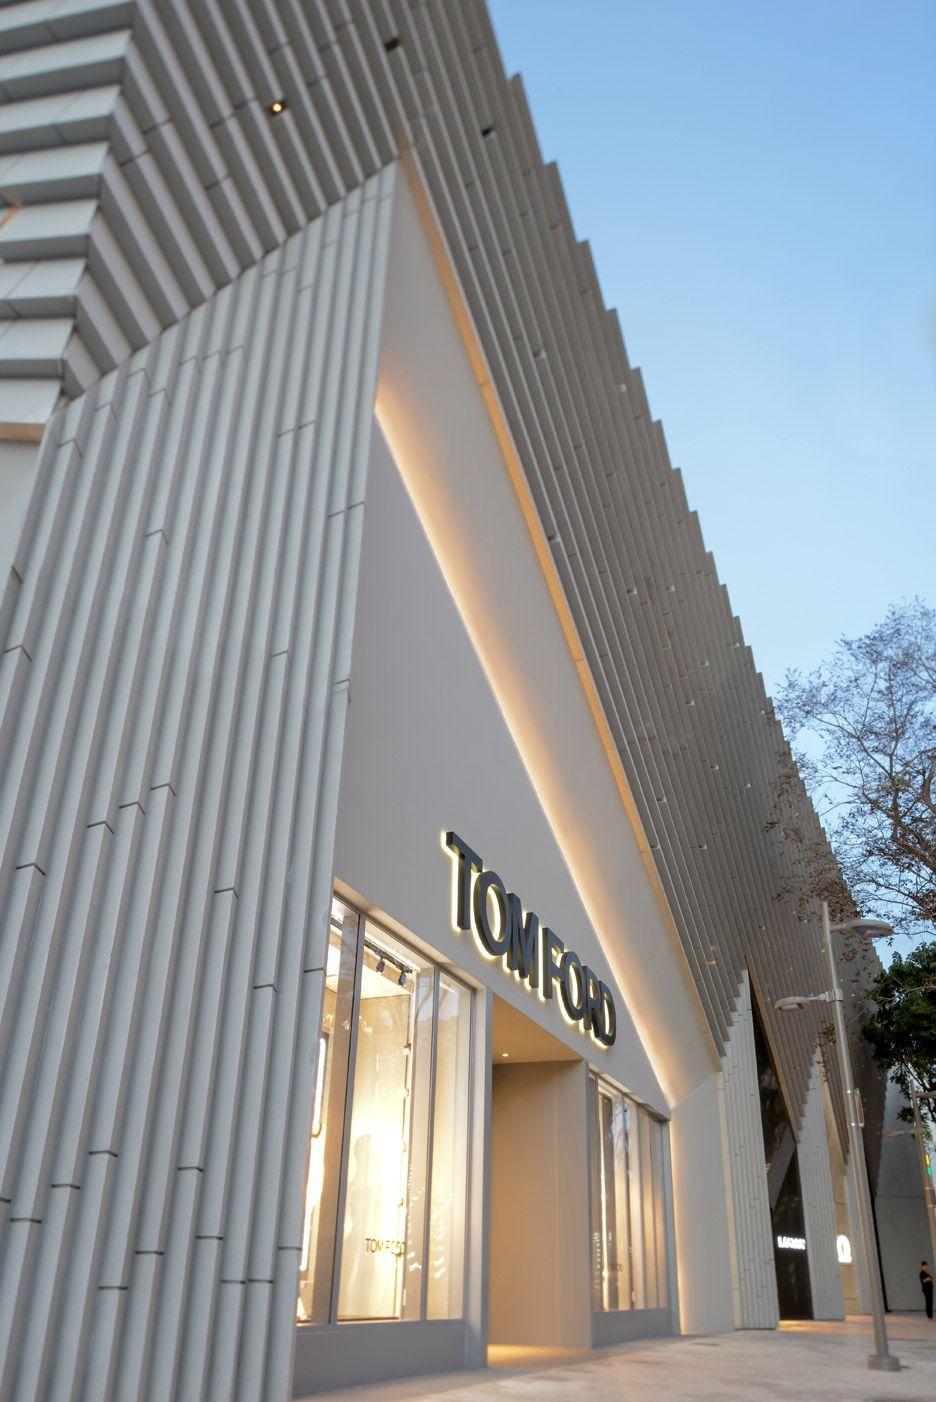 tom ford miami design district by arandalasch architecture pinterest facades. Black Bedroom Furniture Sets. Home Design Ideas